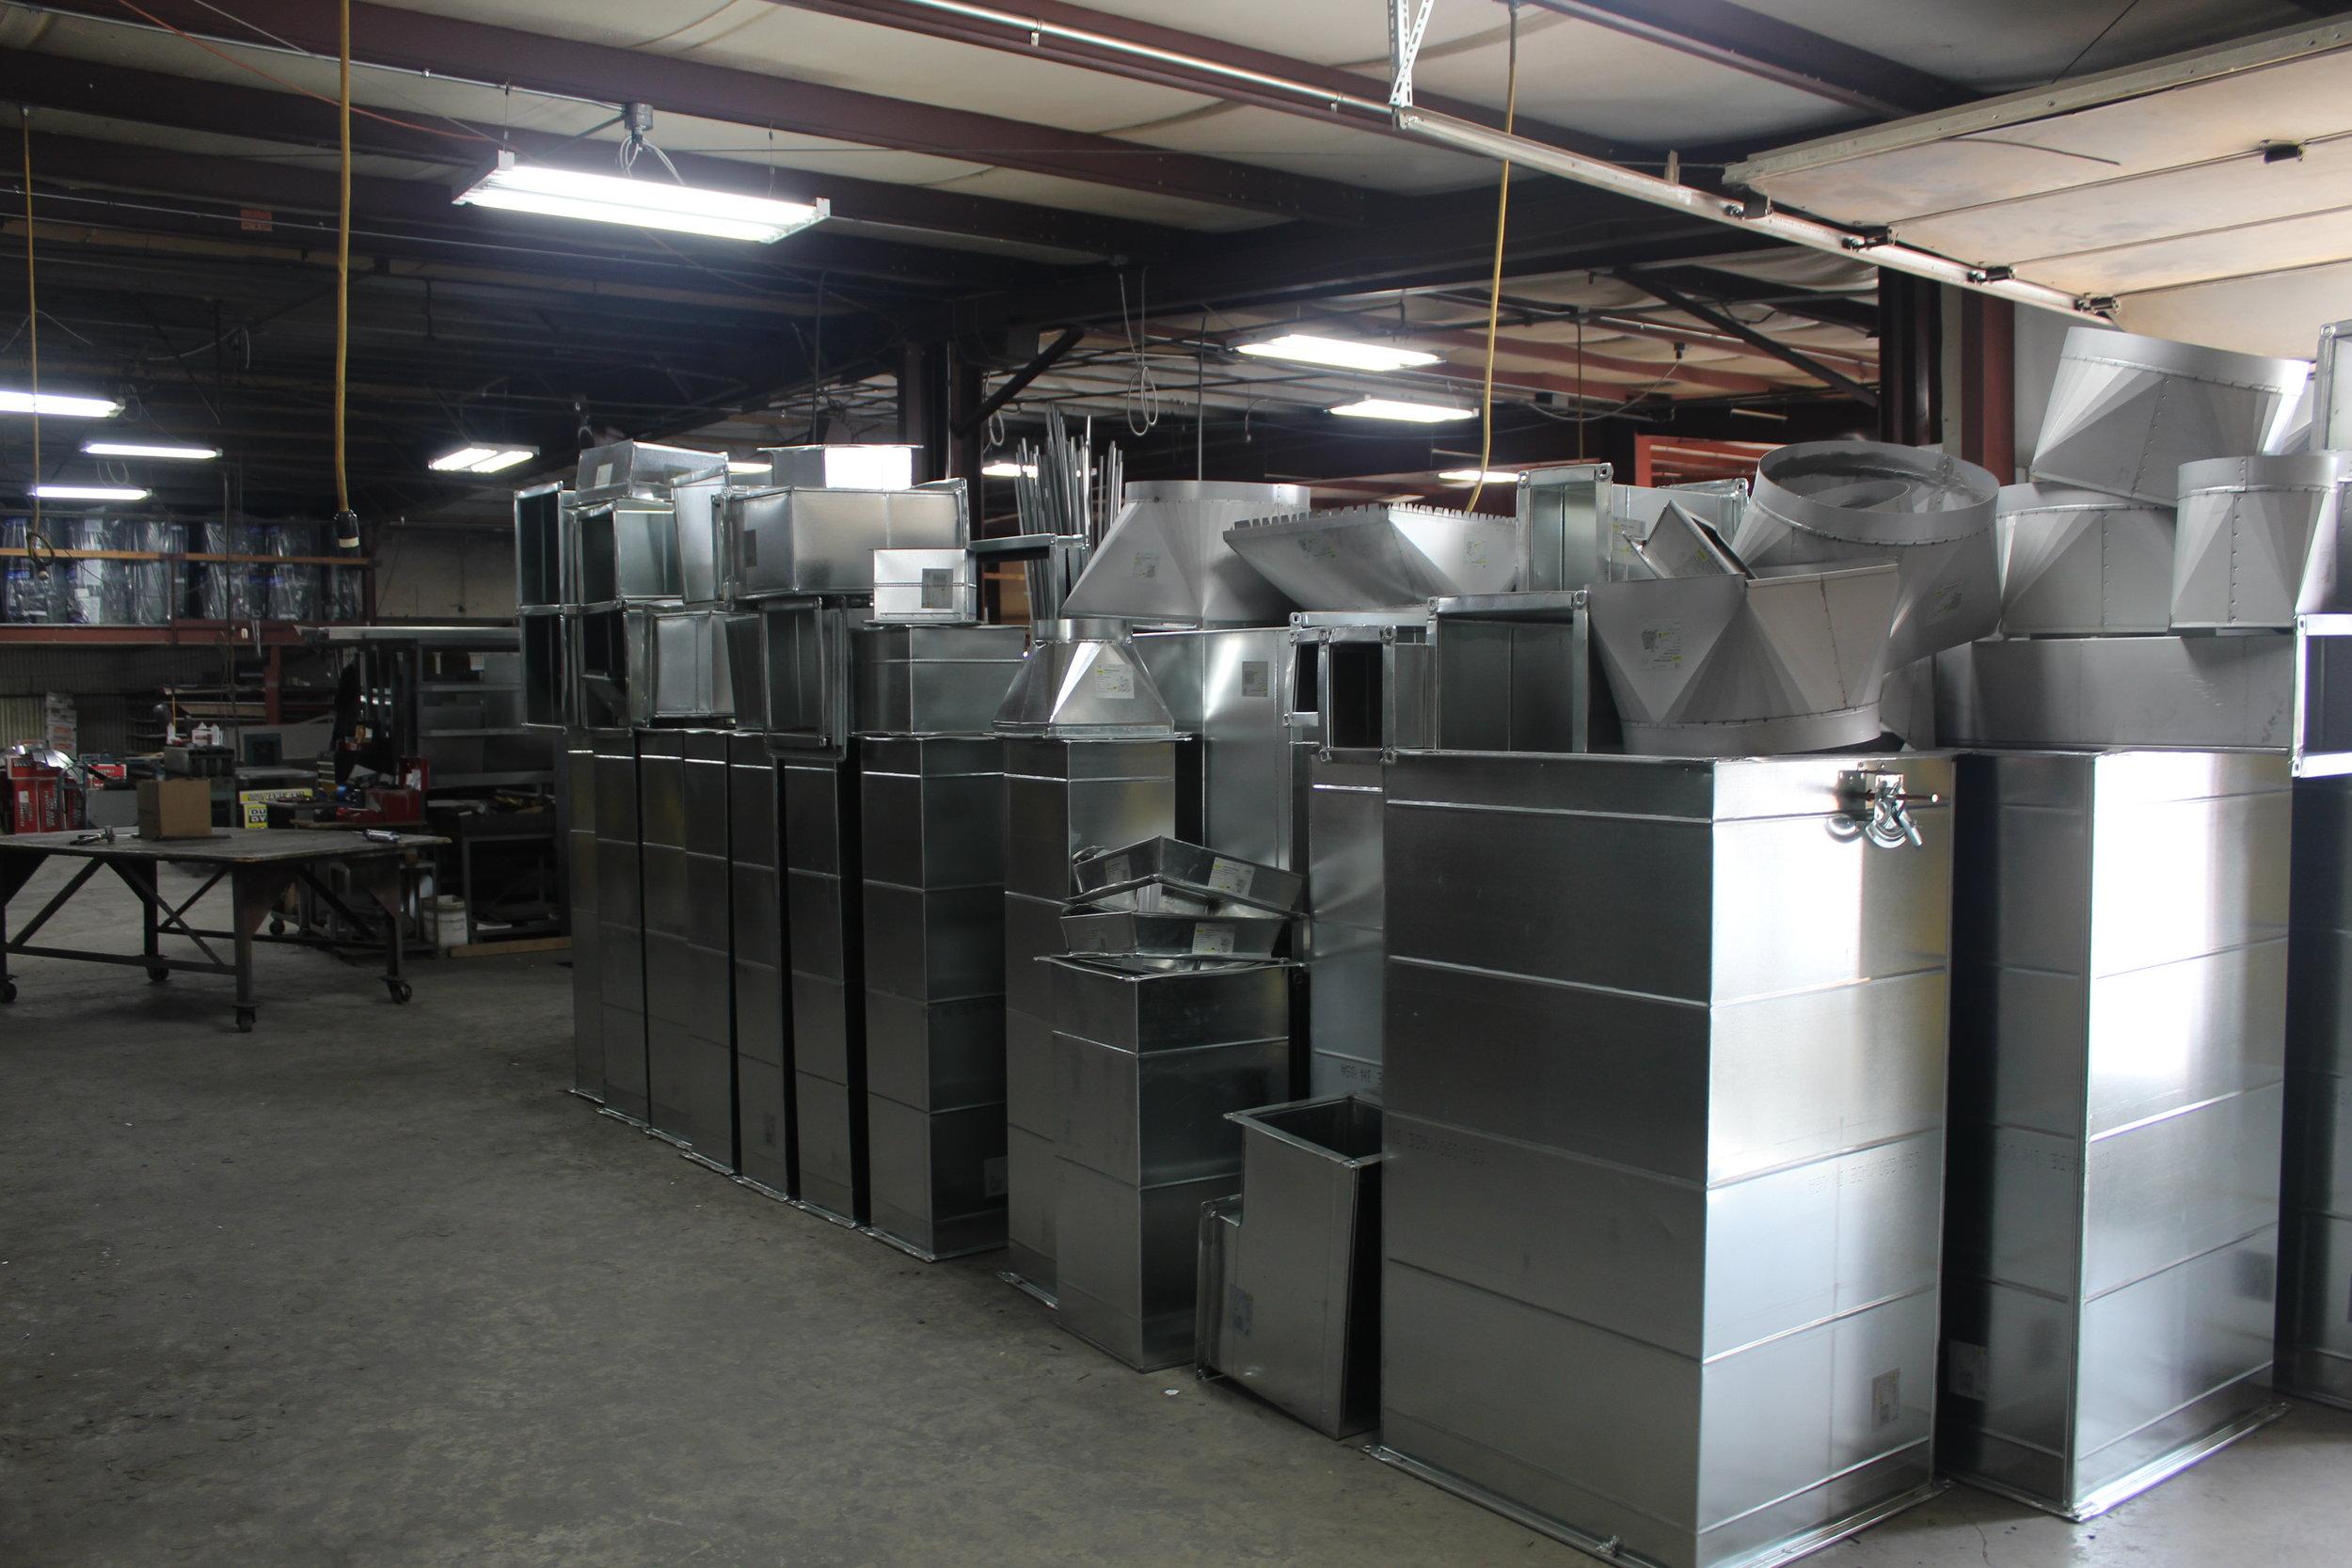 galvanized metal fabrication and installation